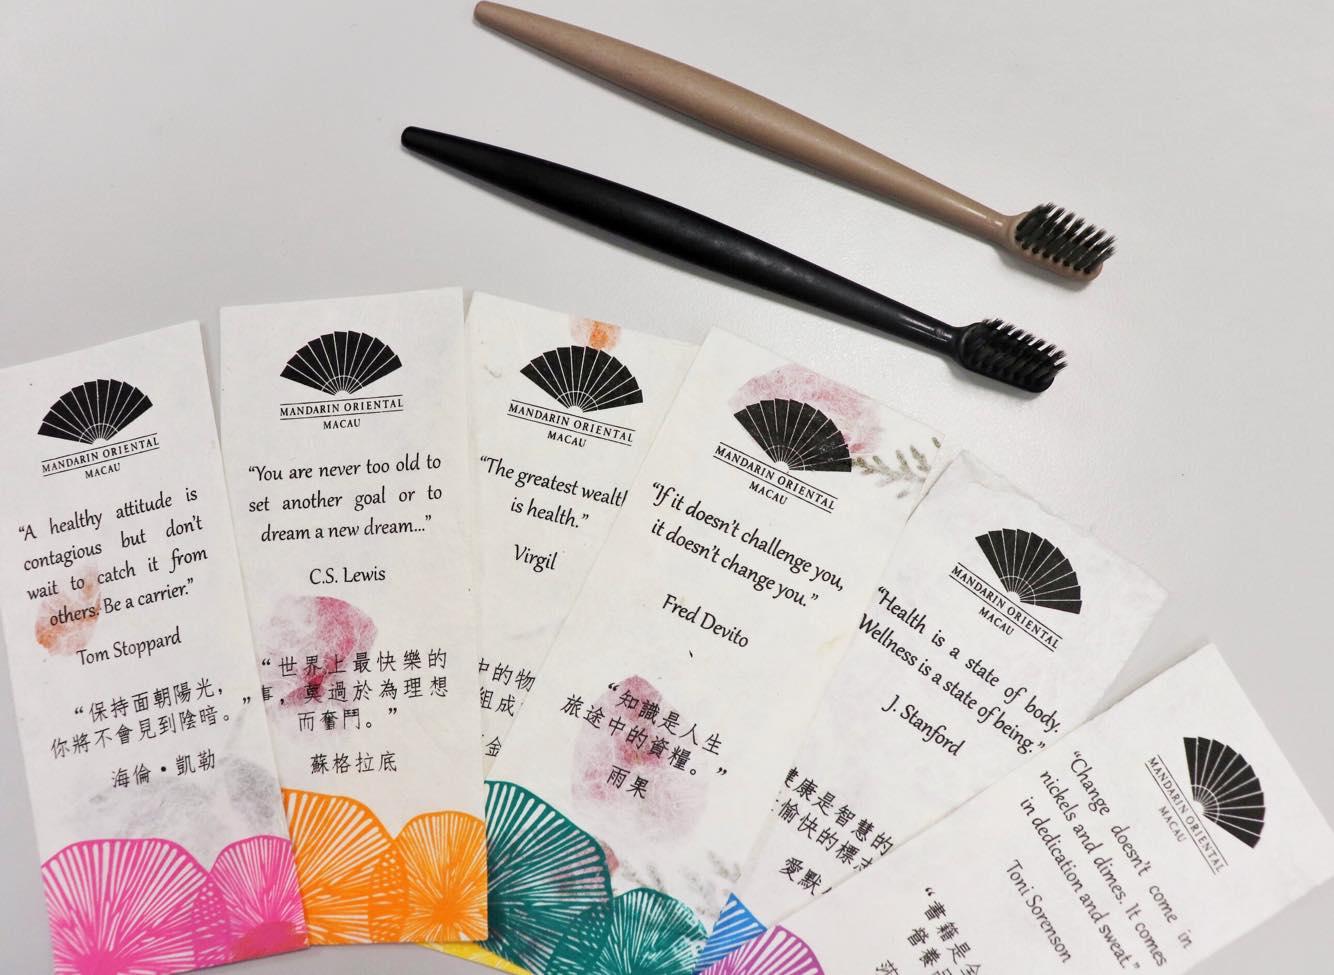 Mandarin Oriental Macau toothbrushes